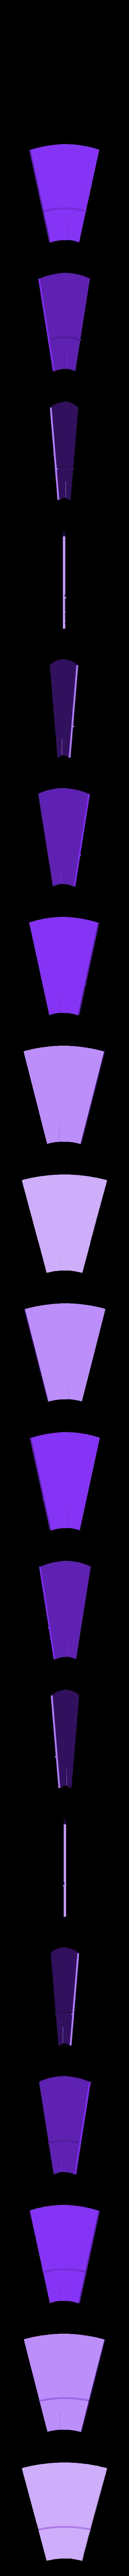 Windmil Prusament Spool_By Dominik Cisar_Blade.stl Download free STL file WINDMILL - PRUSAMENT SPOOL - reuse idea • 3D printer model, cisardom